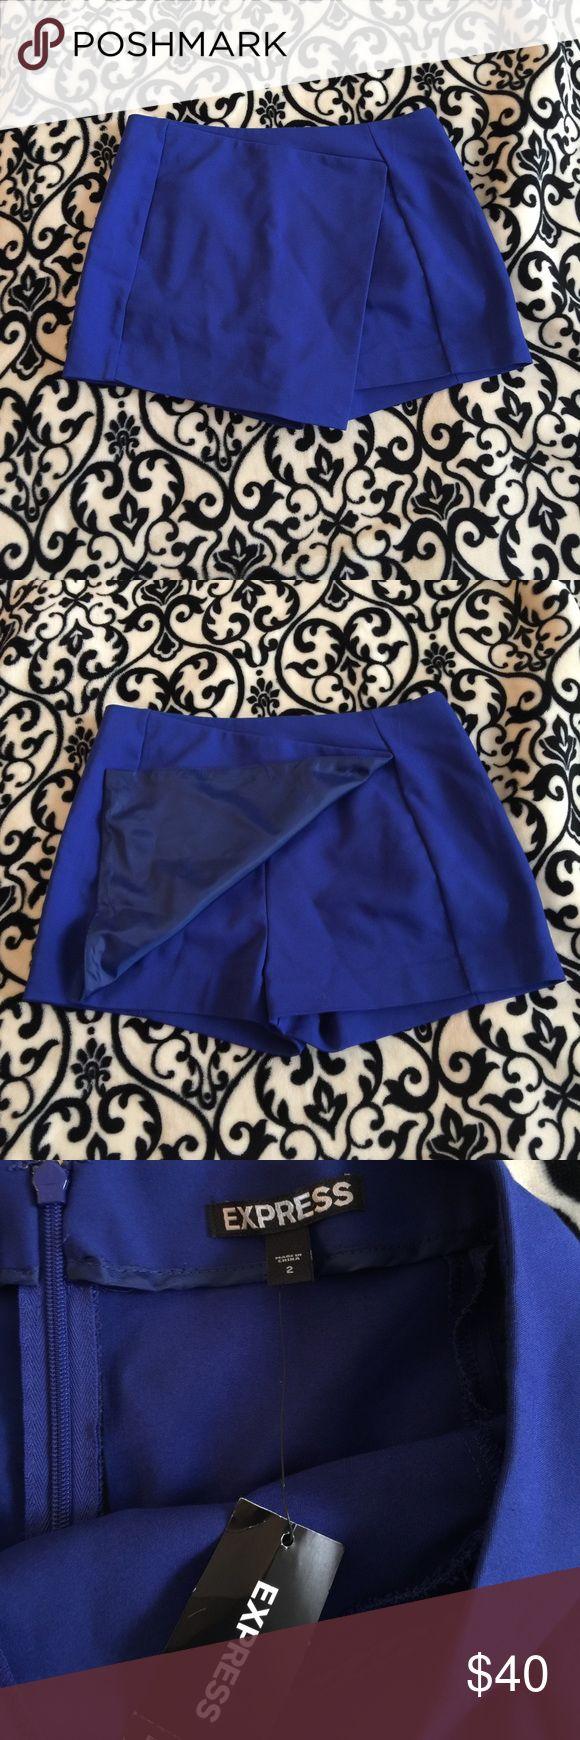 Royal blue skort Royal blue skort with back zipper. NWT never worn tag says 2 but fits more like a 4 Express Shorts Skorts